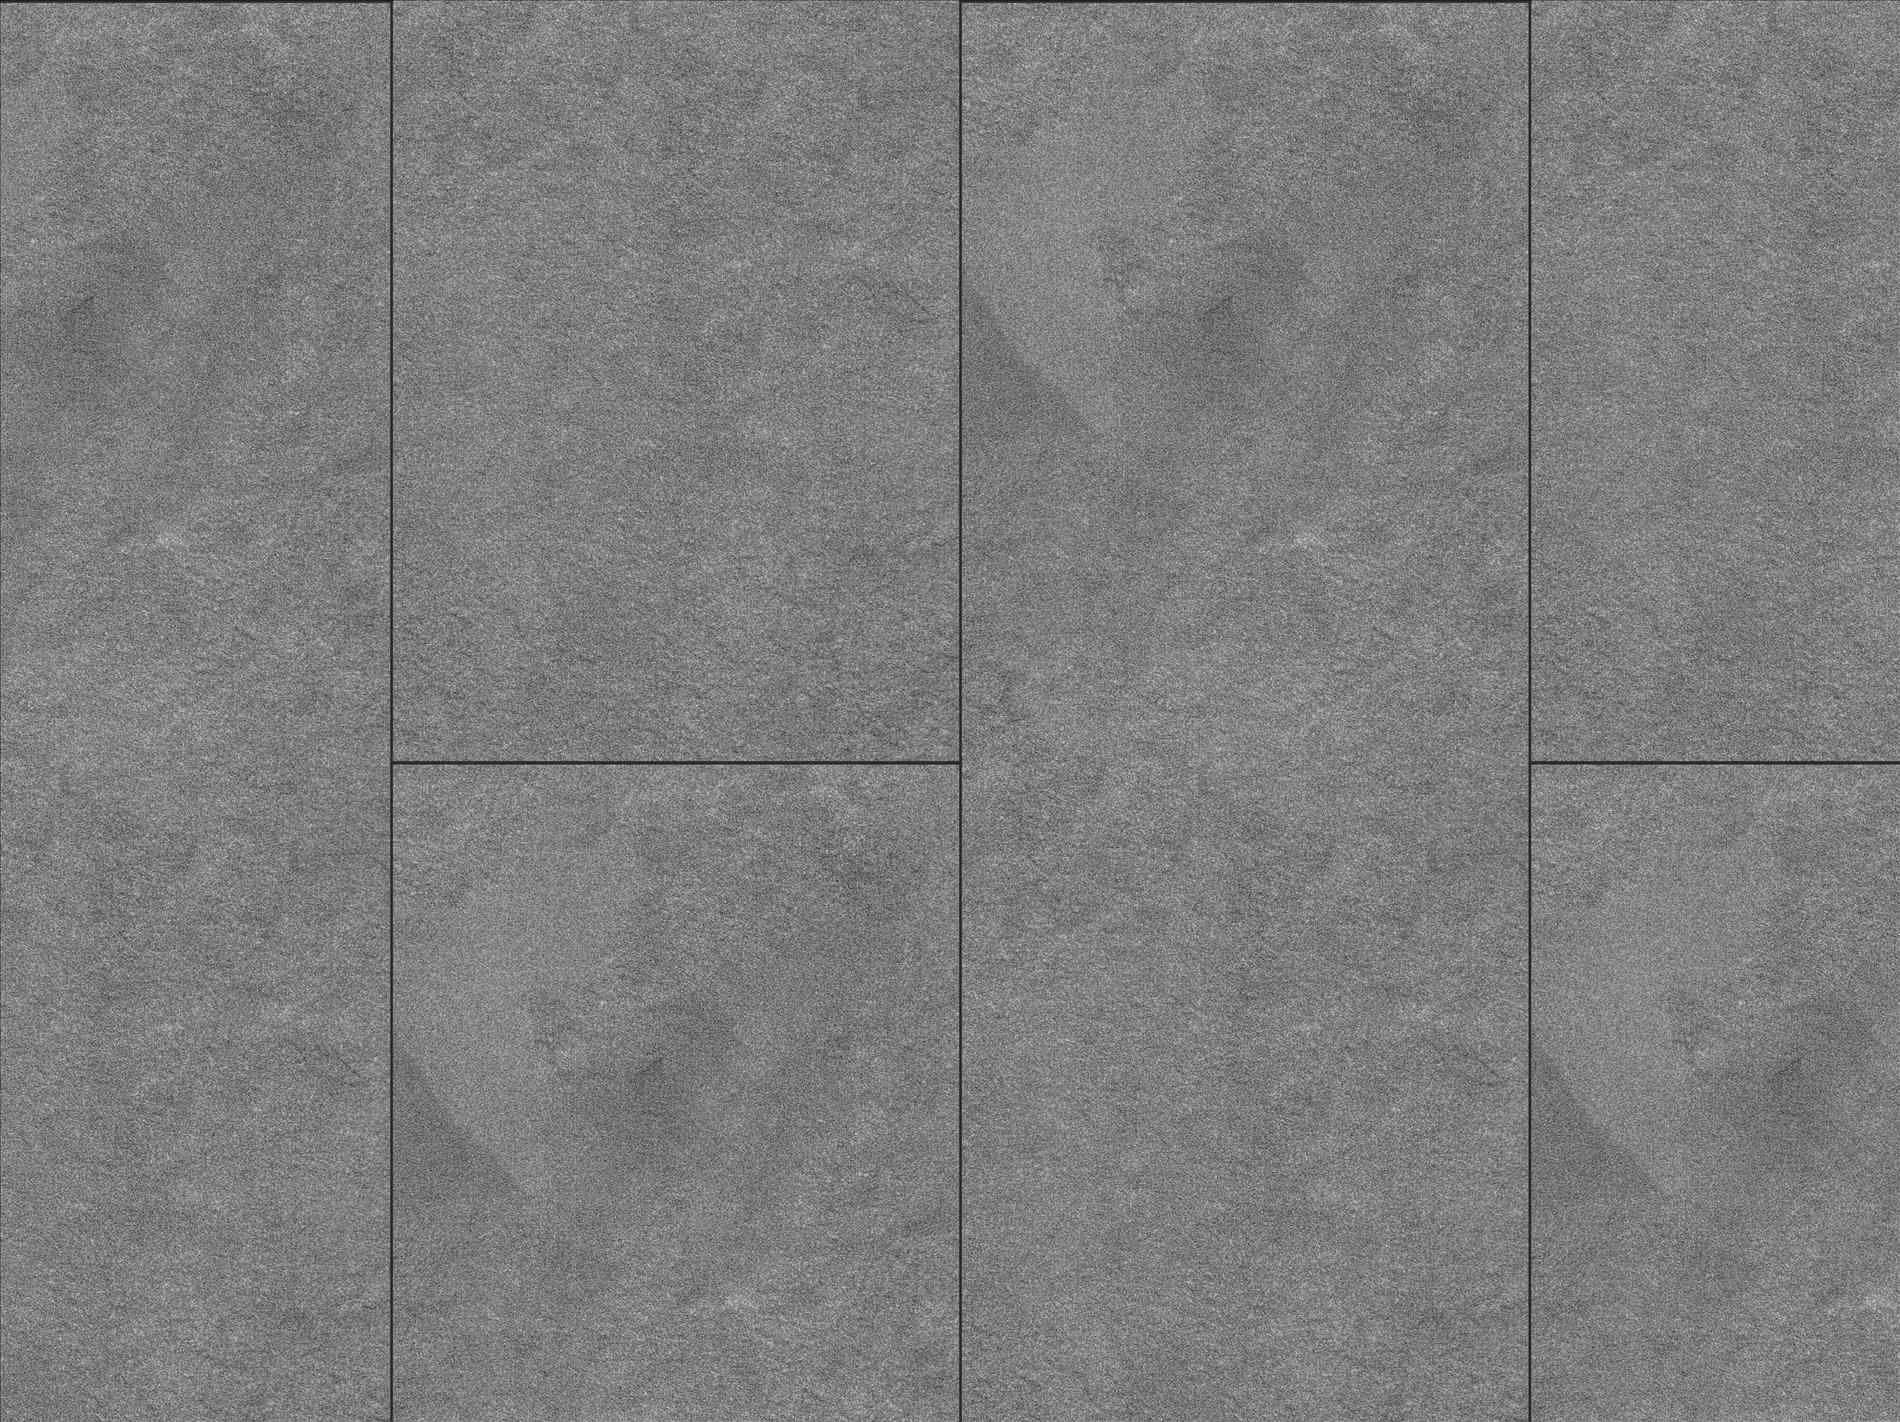 Gray Floor Texture 15 Wonderful Grey Bathroom Floor Tiles